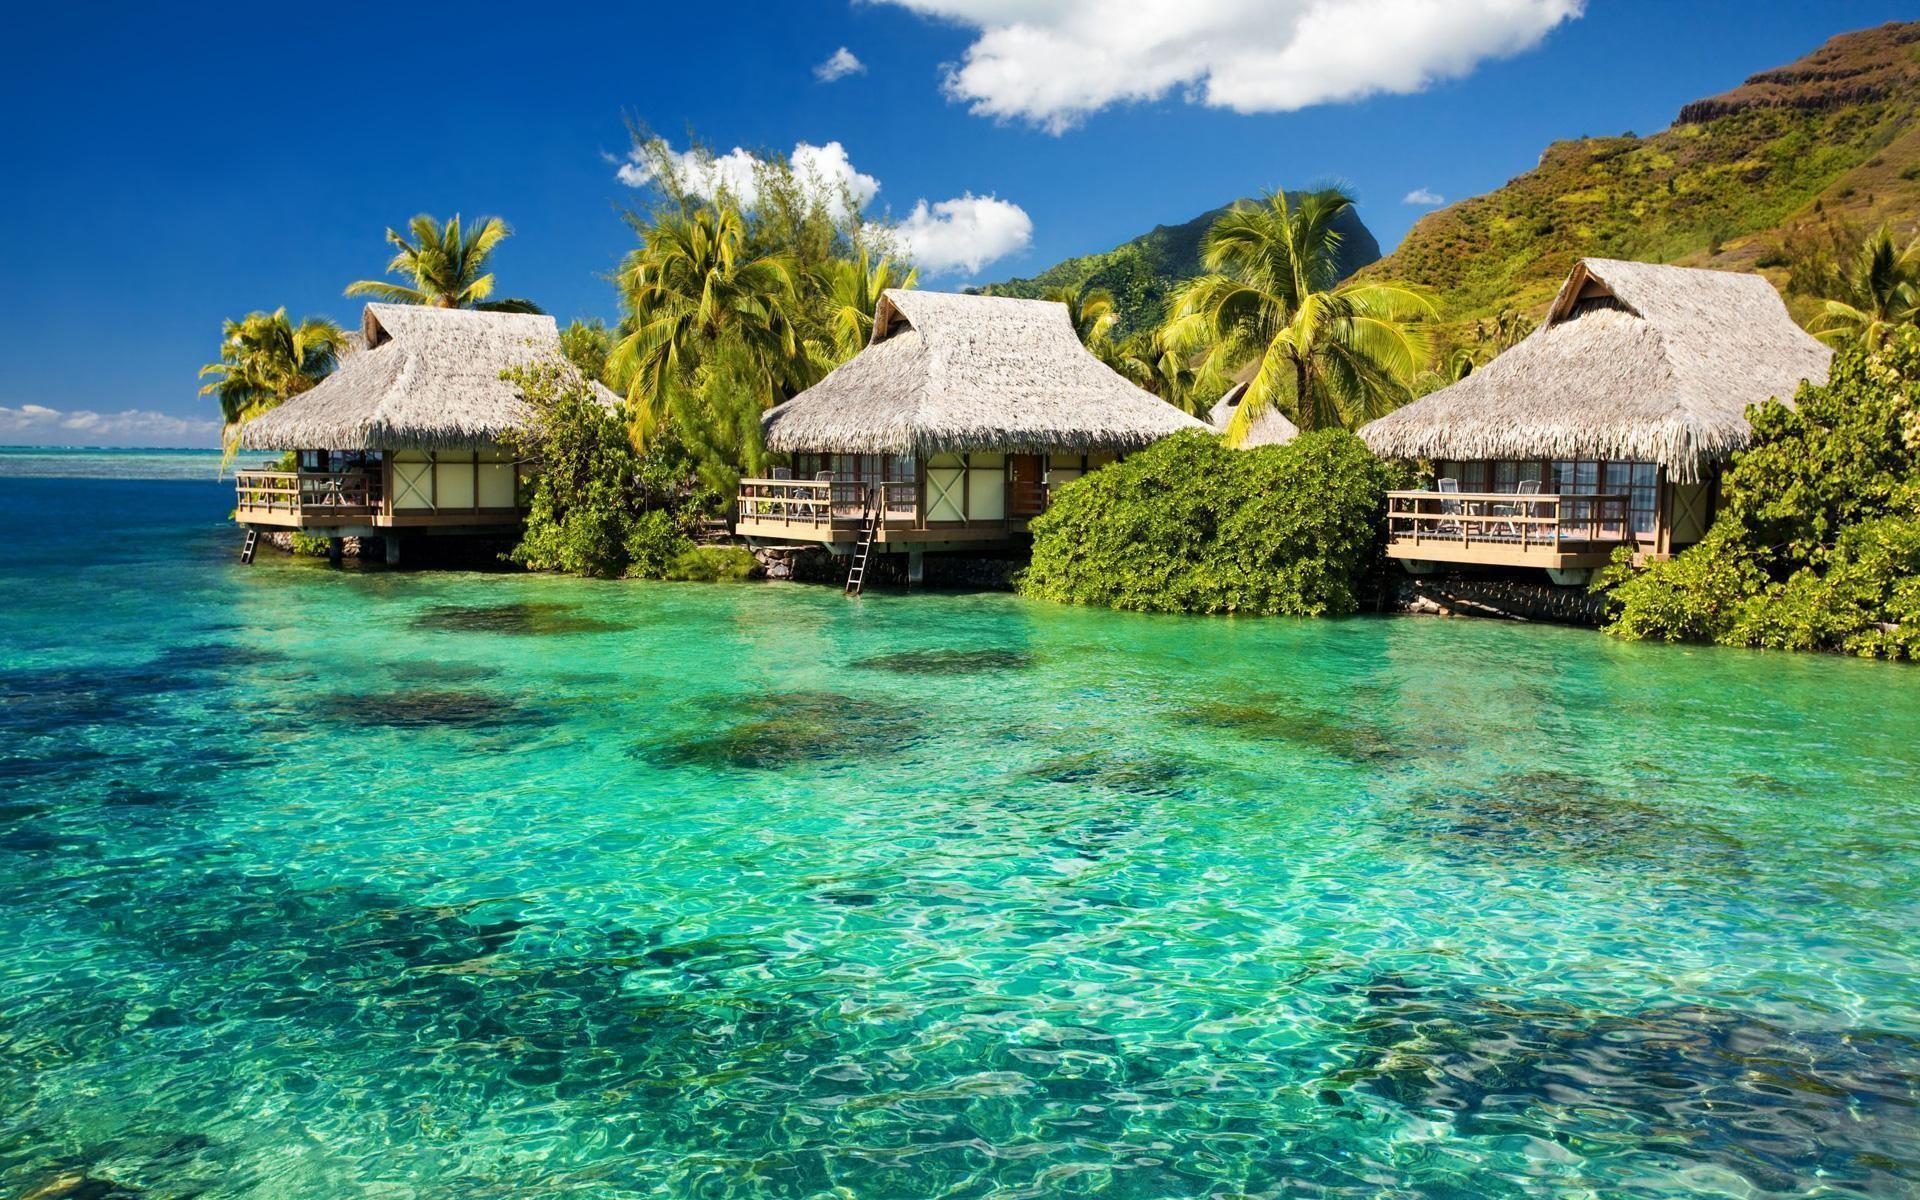 wallpaper desktop house beach scene ocean –   Images And ..